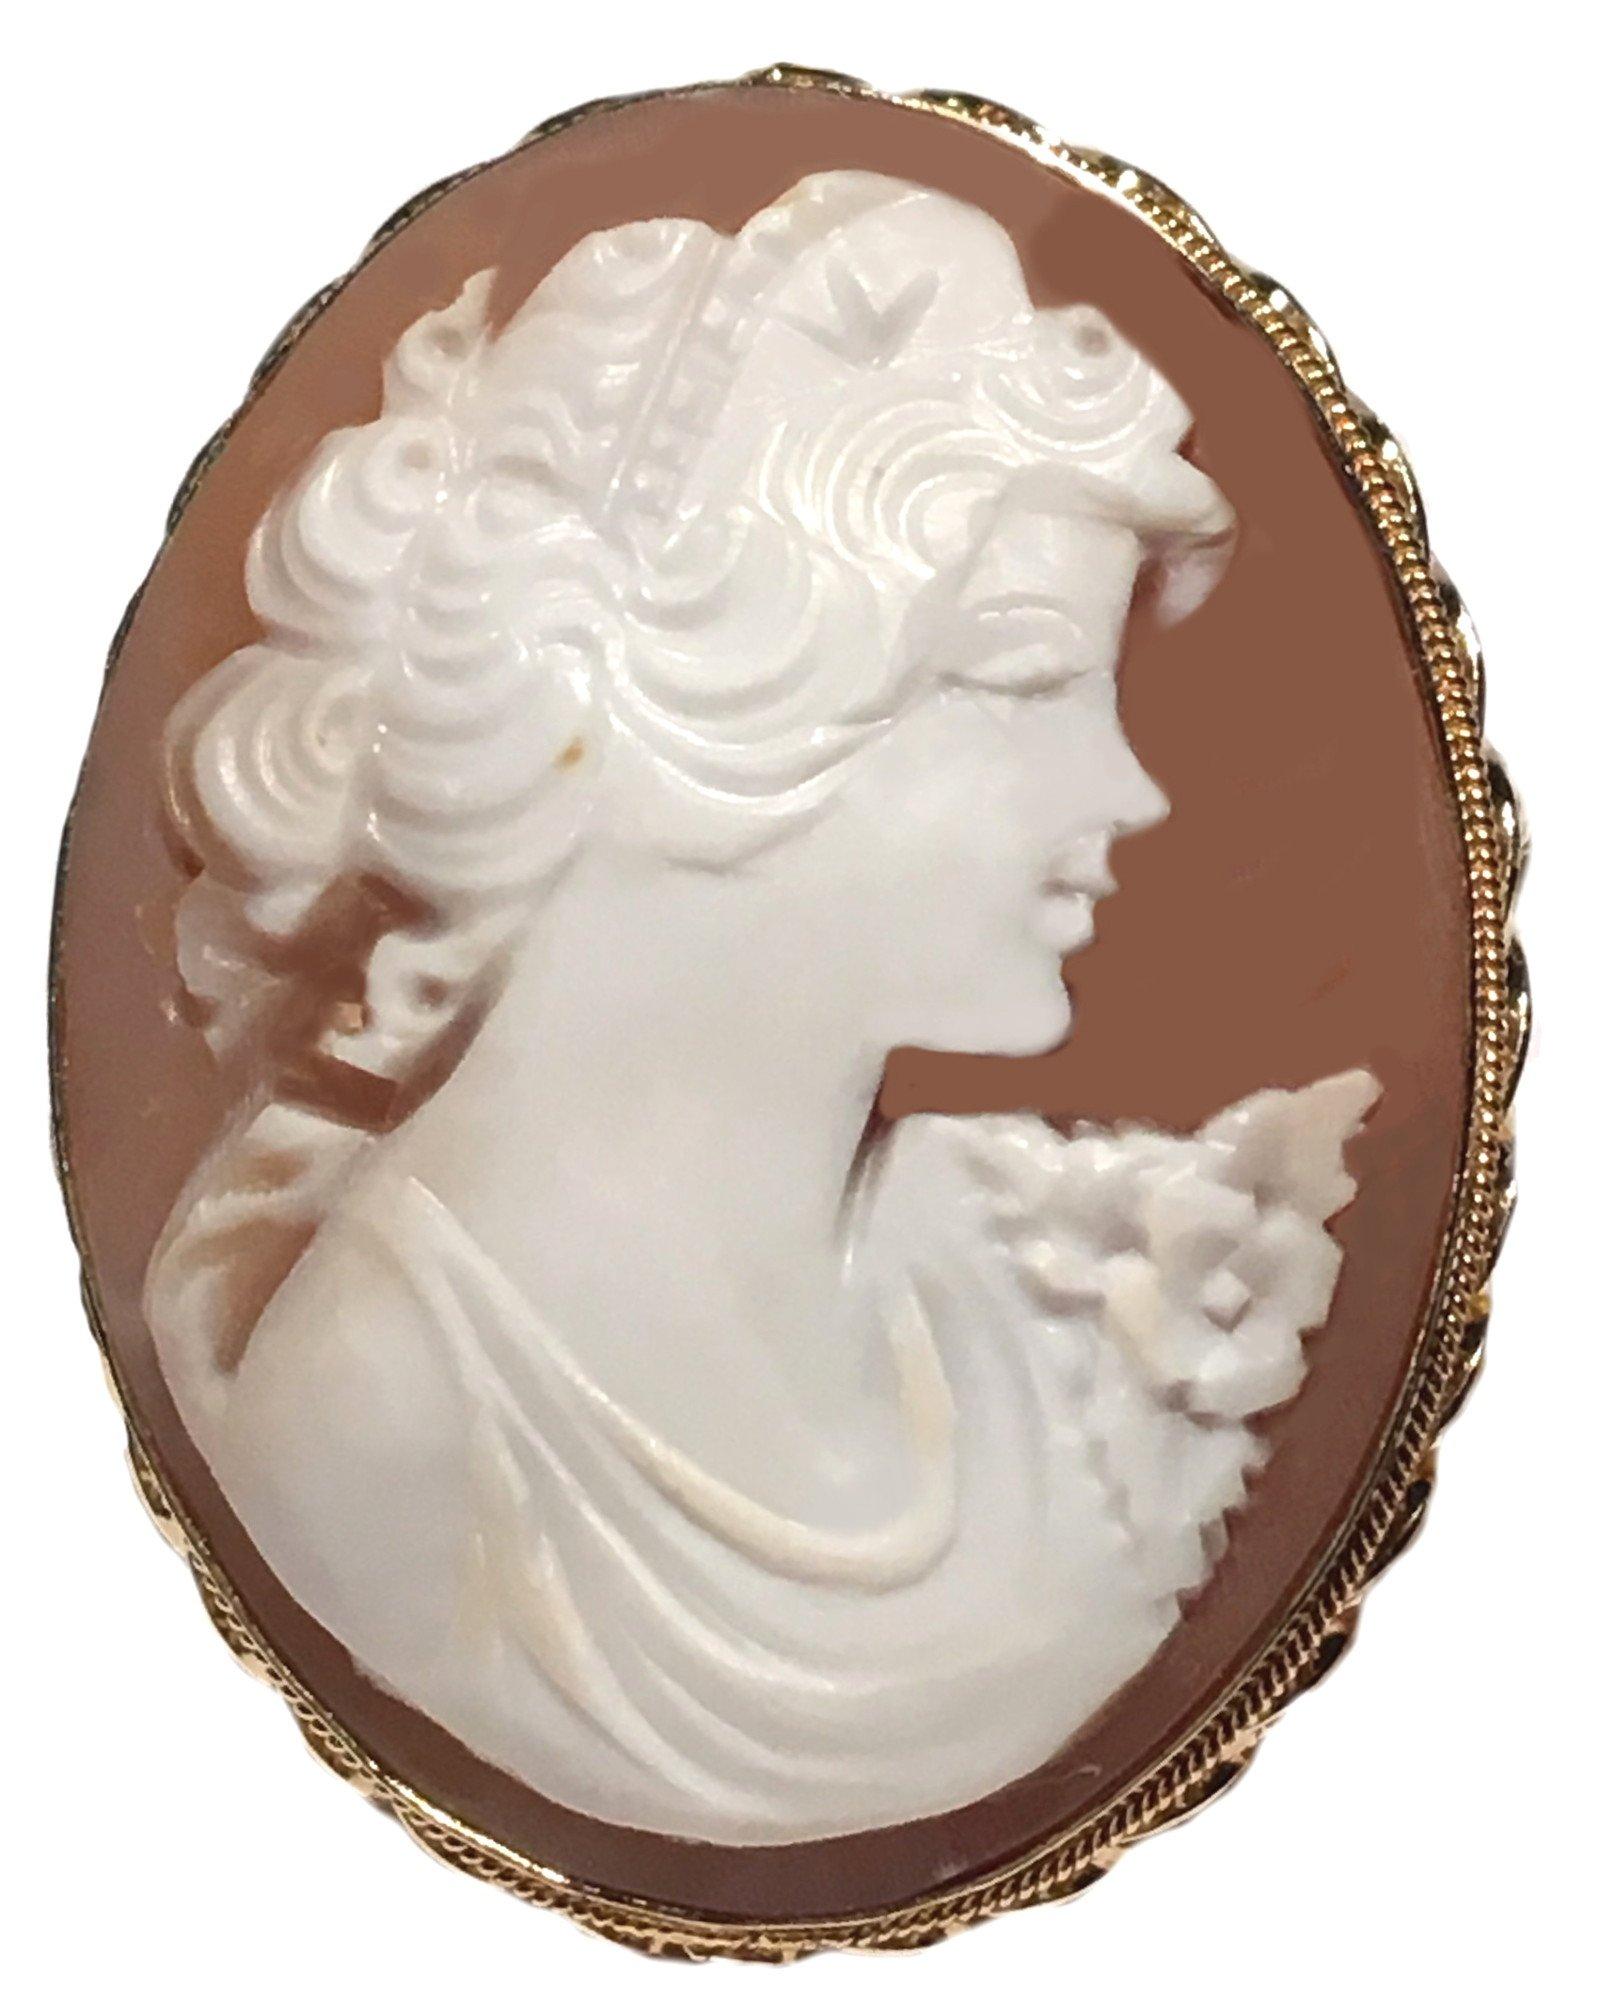 Cameo Brooch Pendant Master Carved, Autumn Love, Sterling Silver 18k Gold Overlay Sardonyx Shell Italian